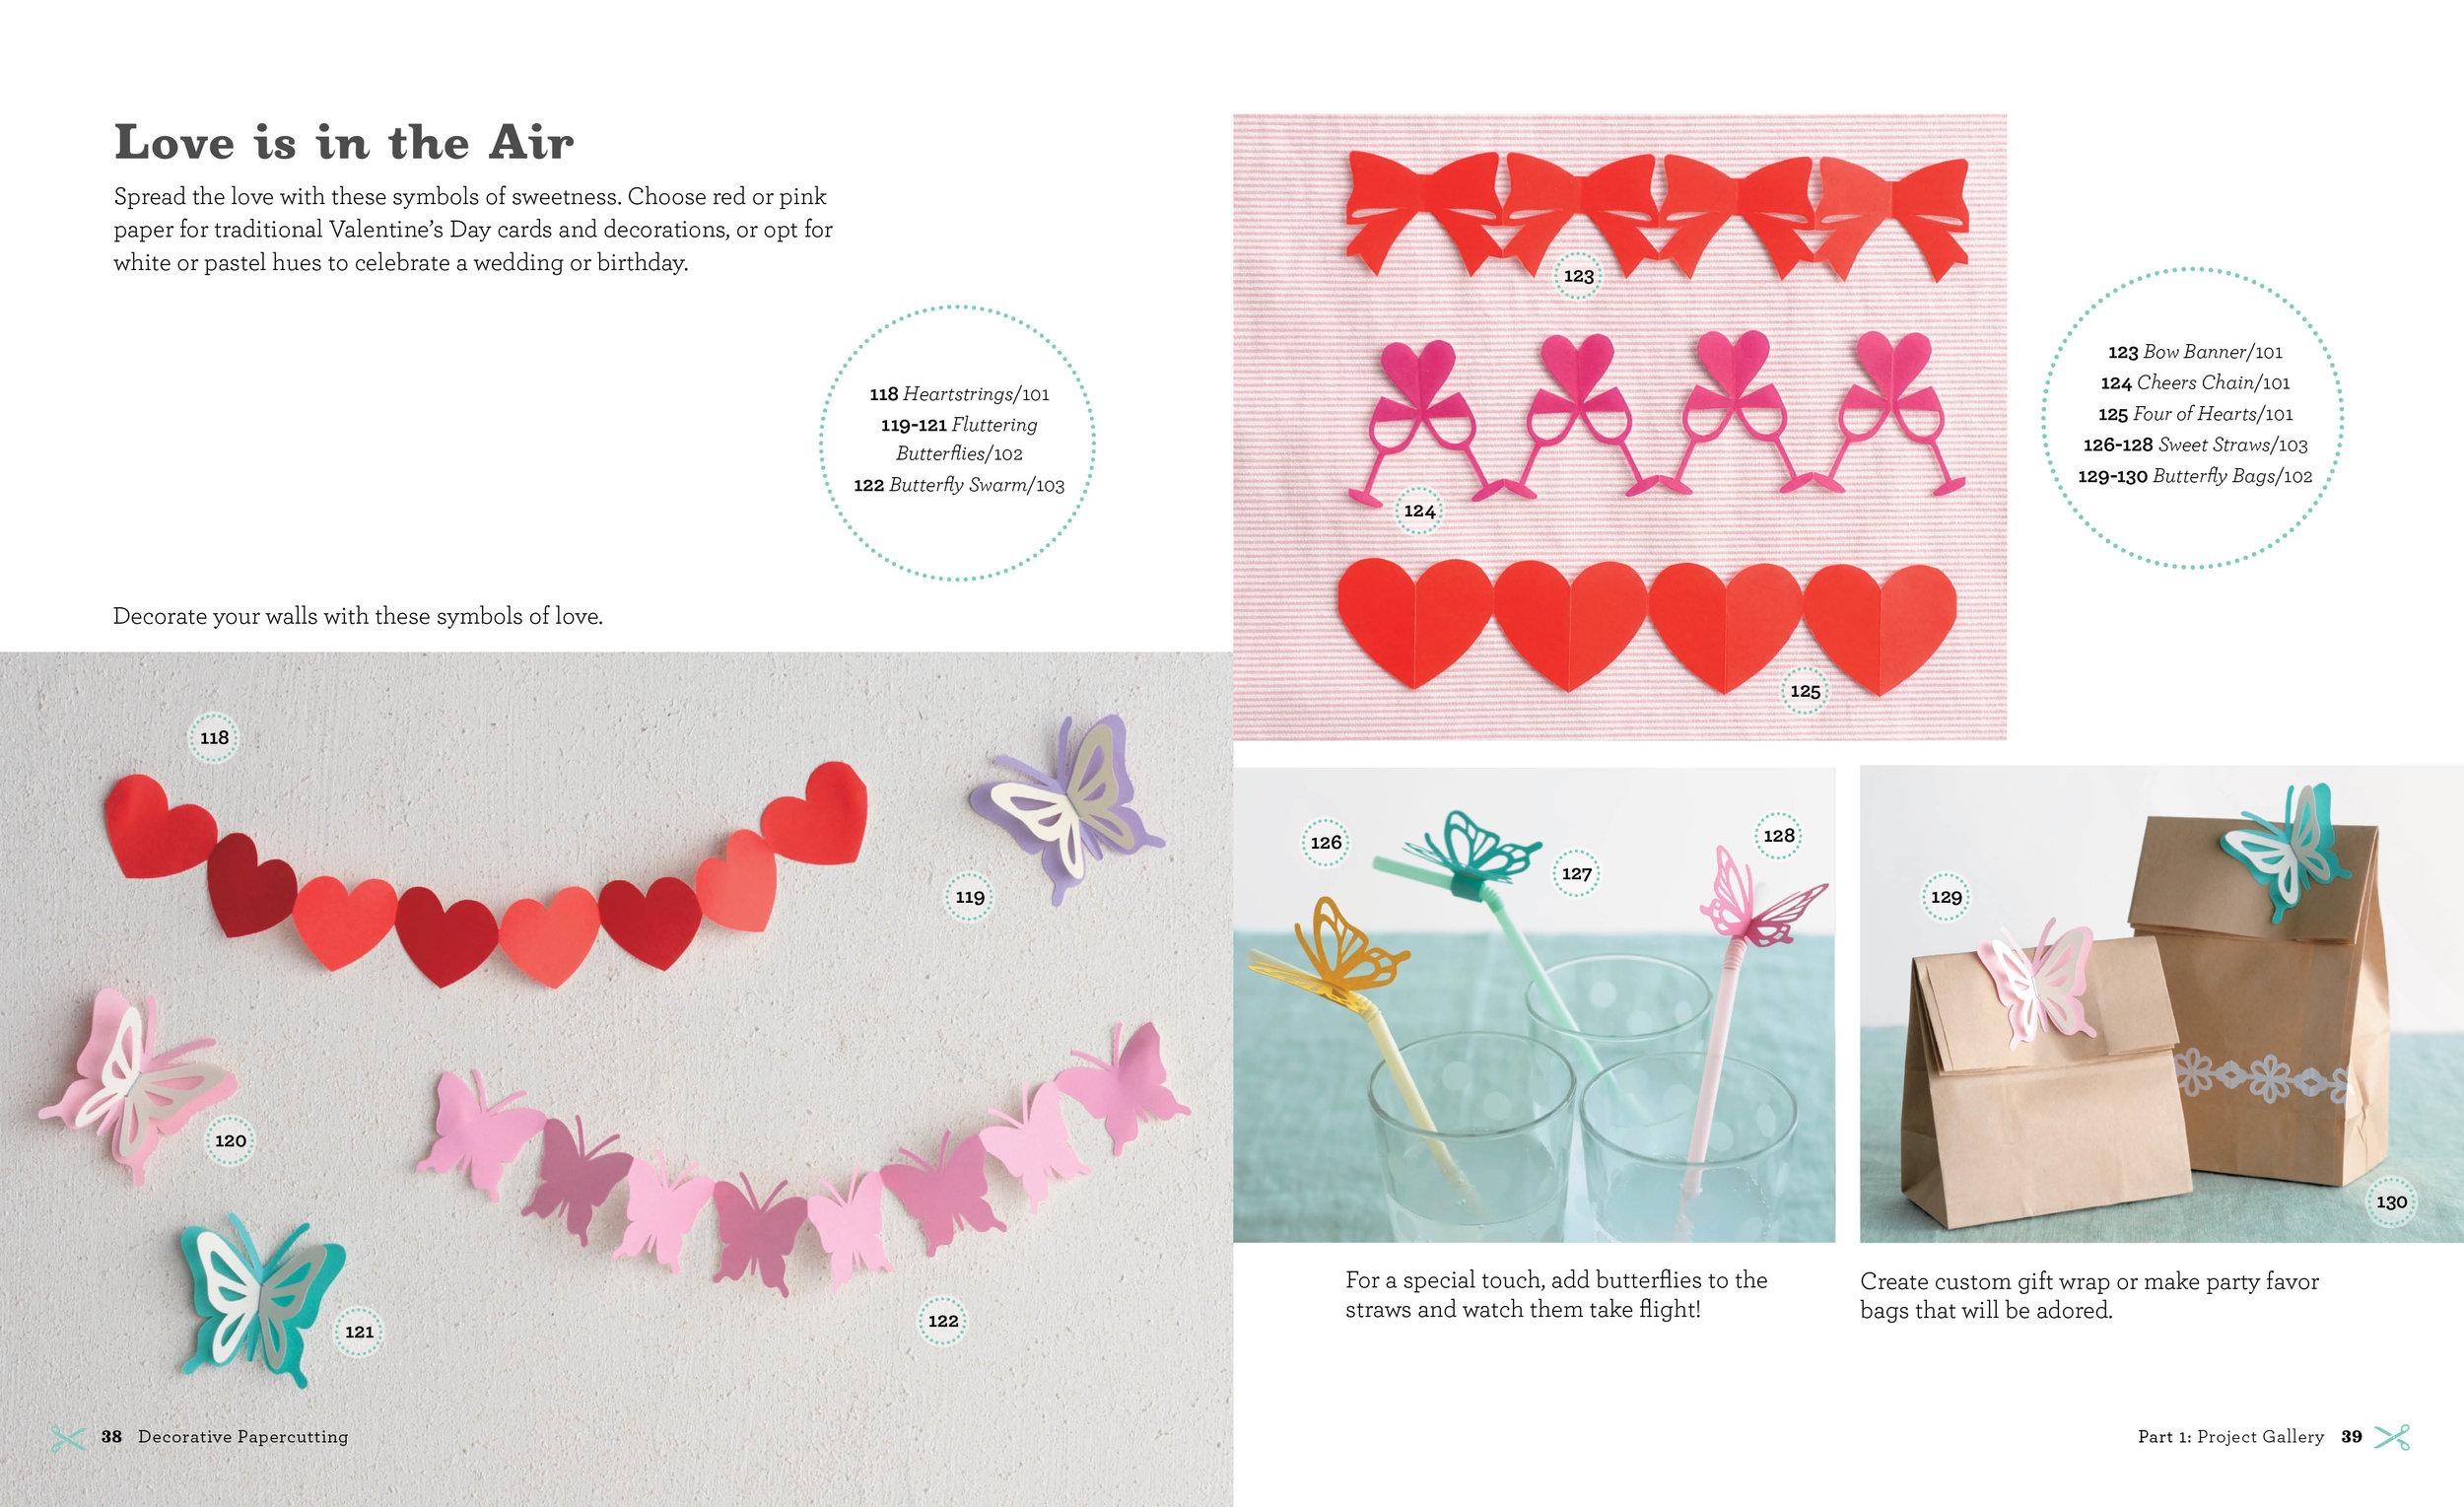 Decorative Papercutting 38.39.jpg